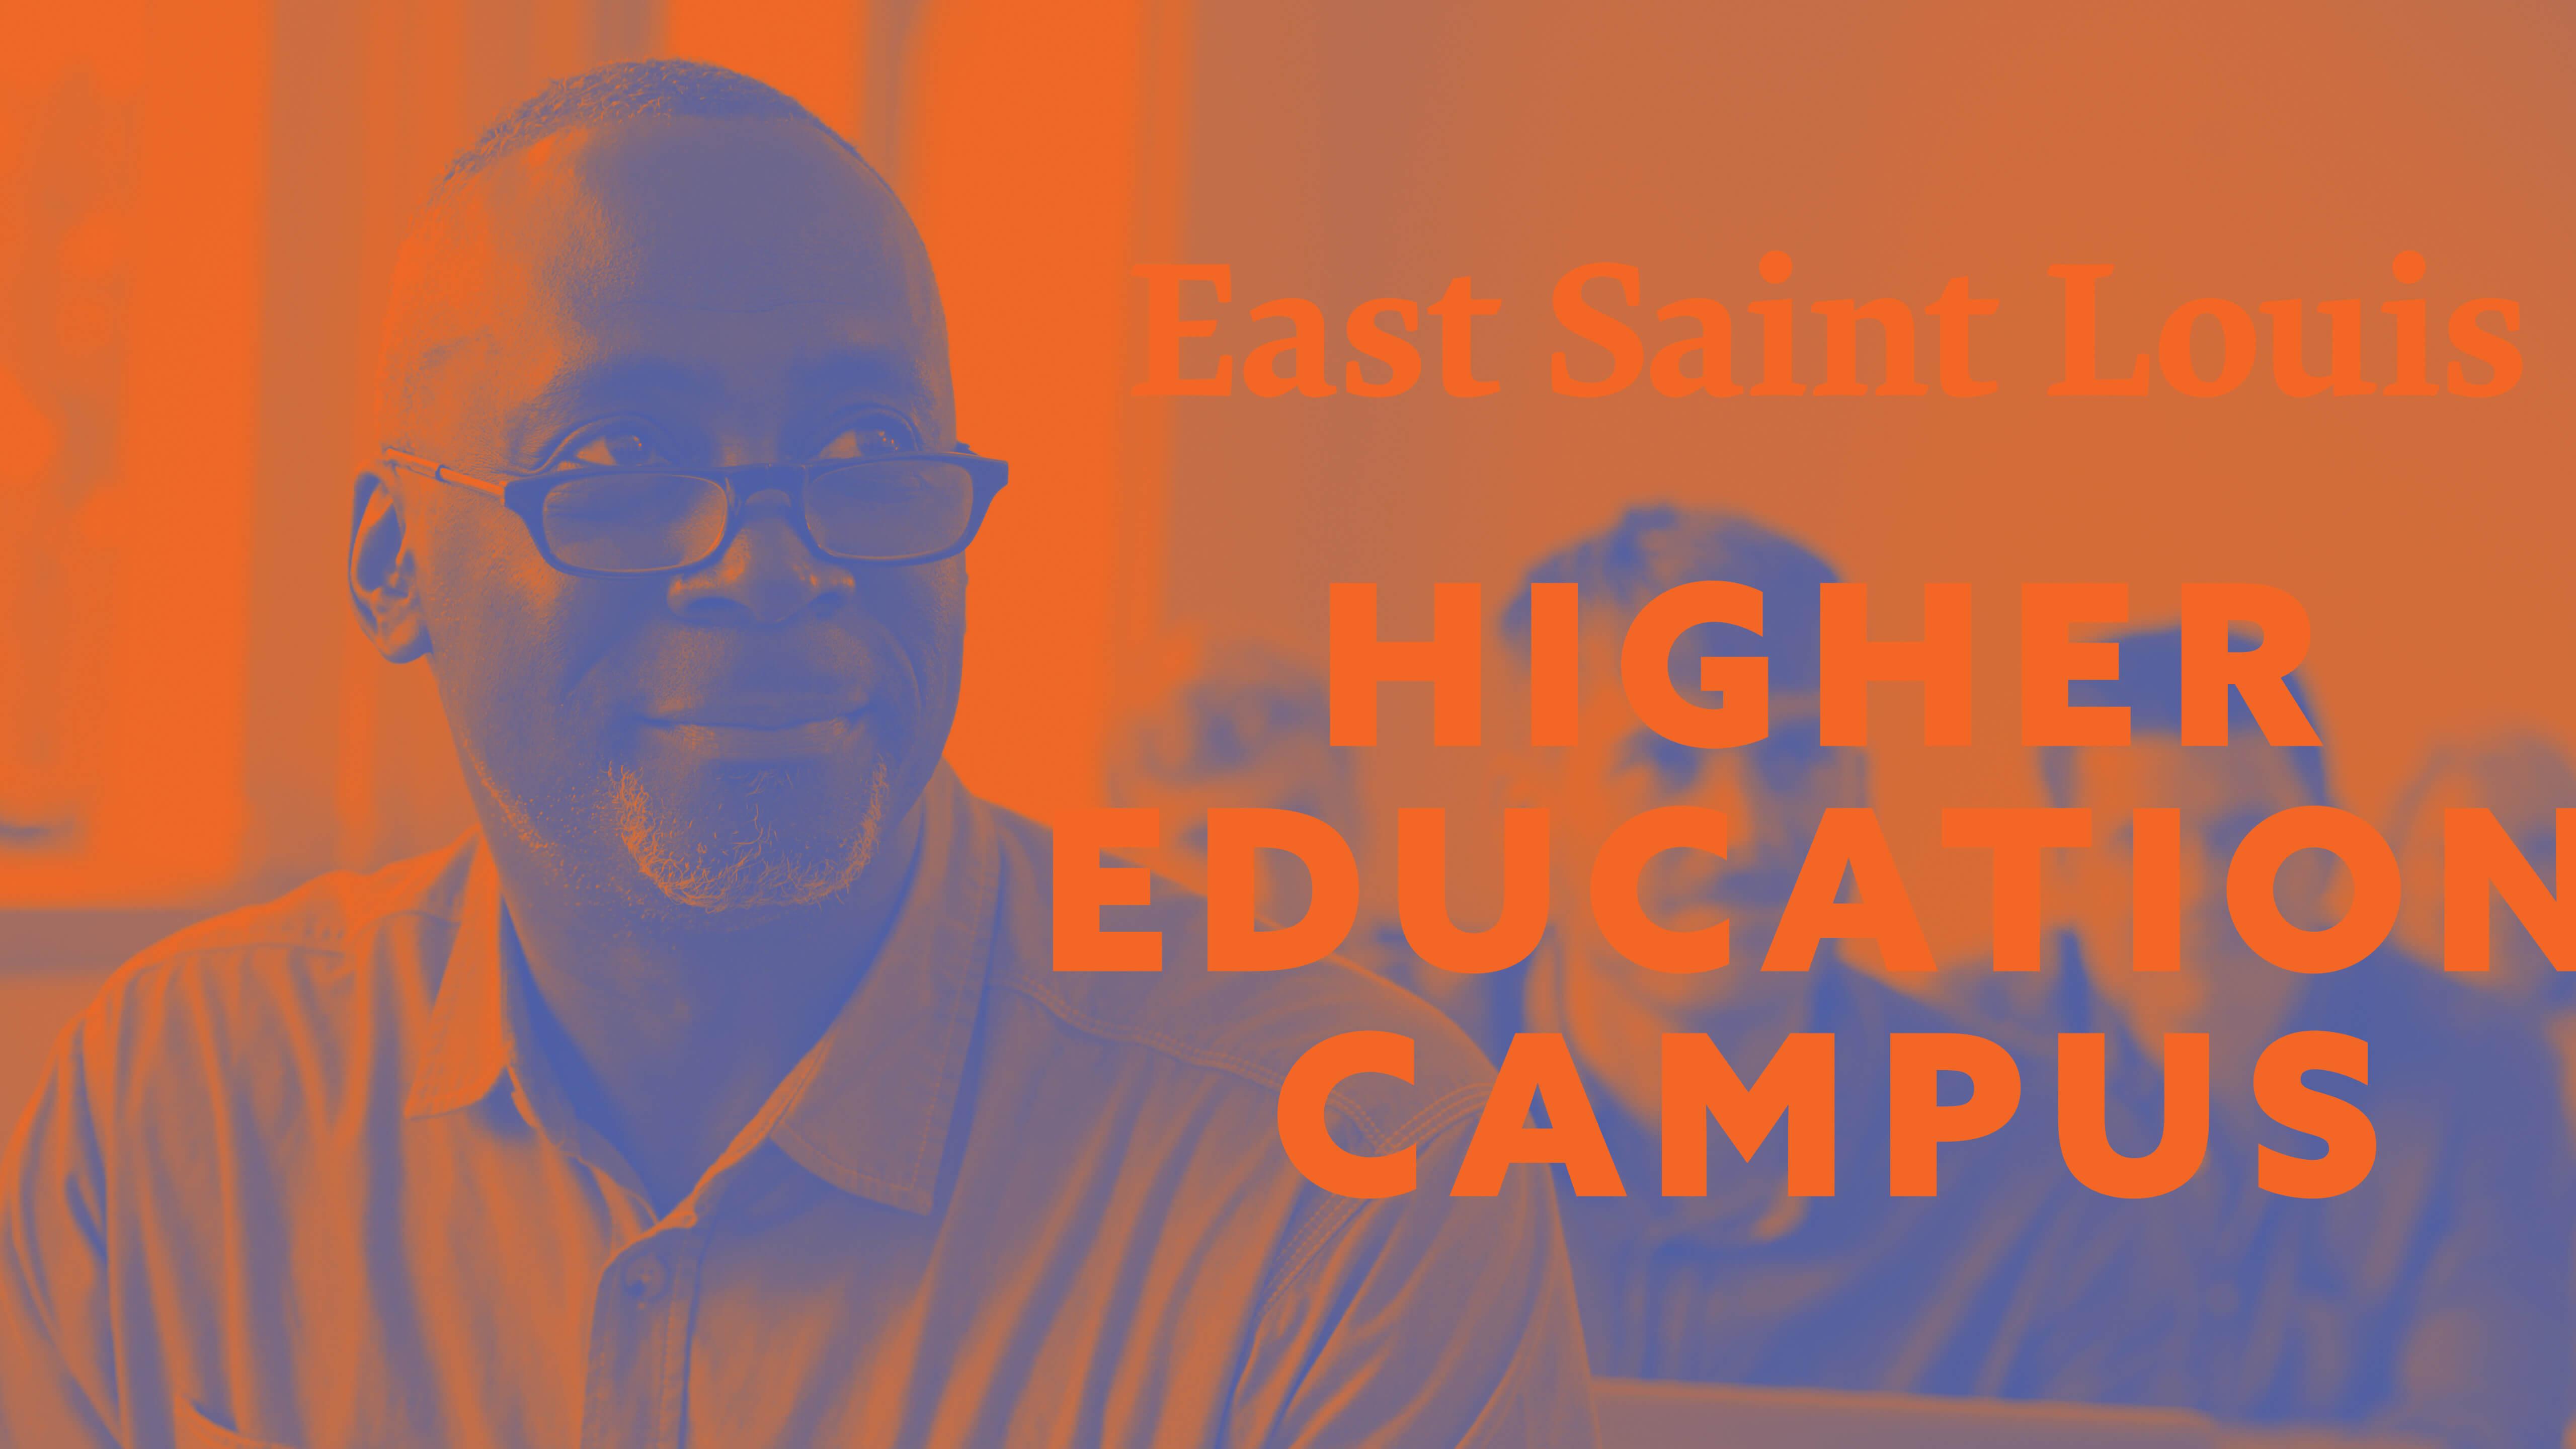 East Saint Louis Higher Education Campus - Branding